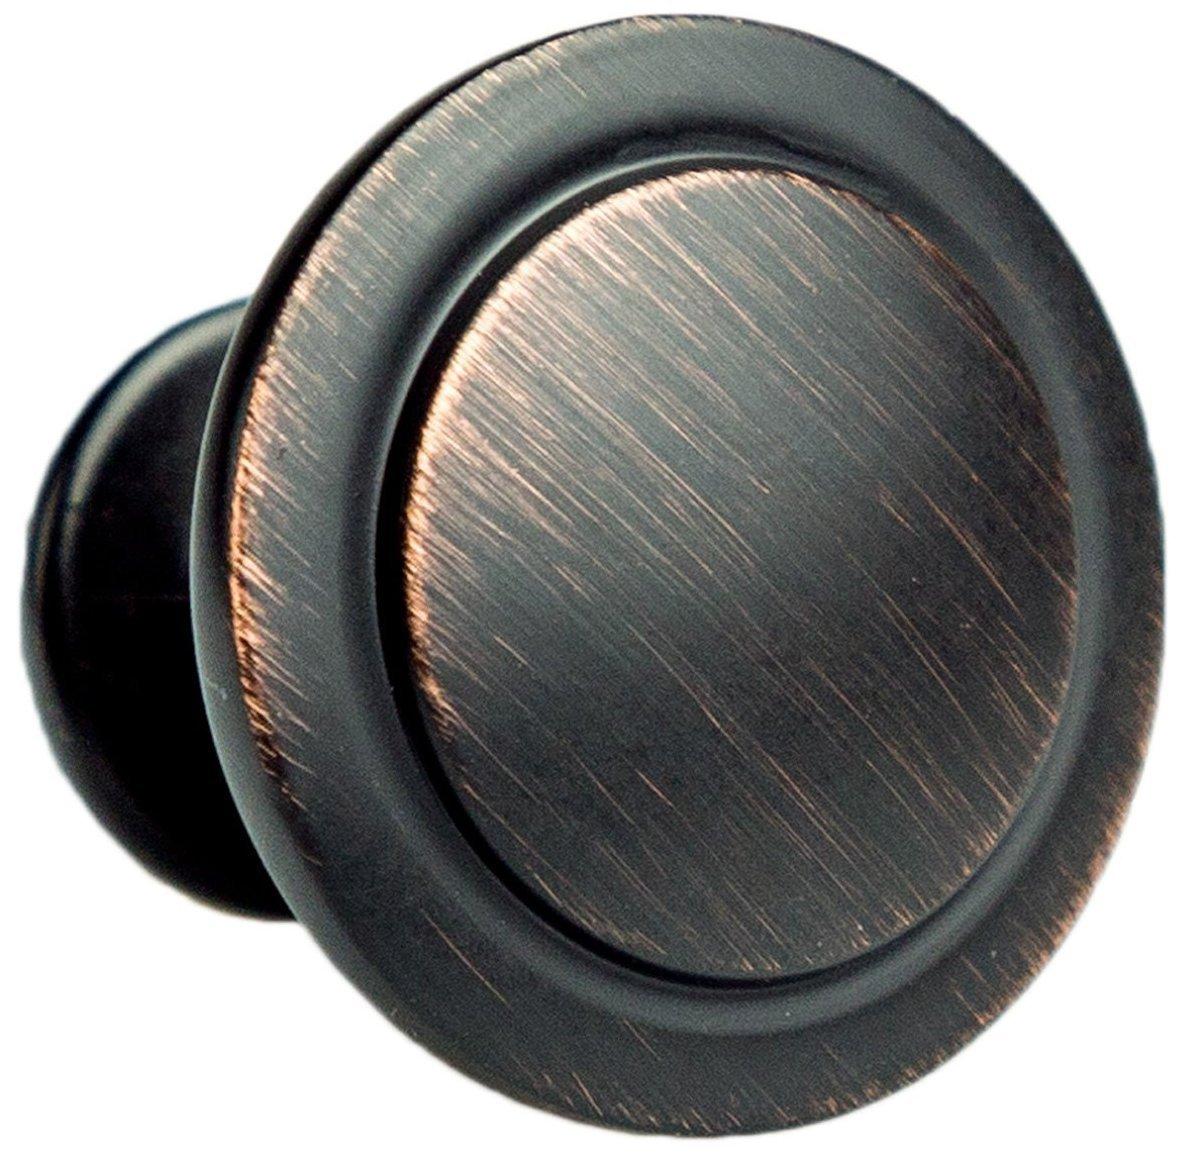 Oil Rubbed Bronze Kitchen Cabinet Knobs - 1 1/4 Inch Round Drawer Handles - 10 Pack of Kitchen Cabinet Hardware